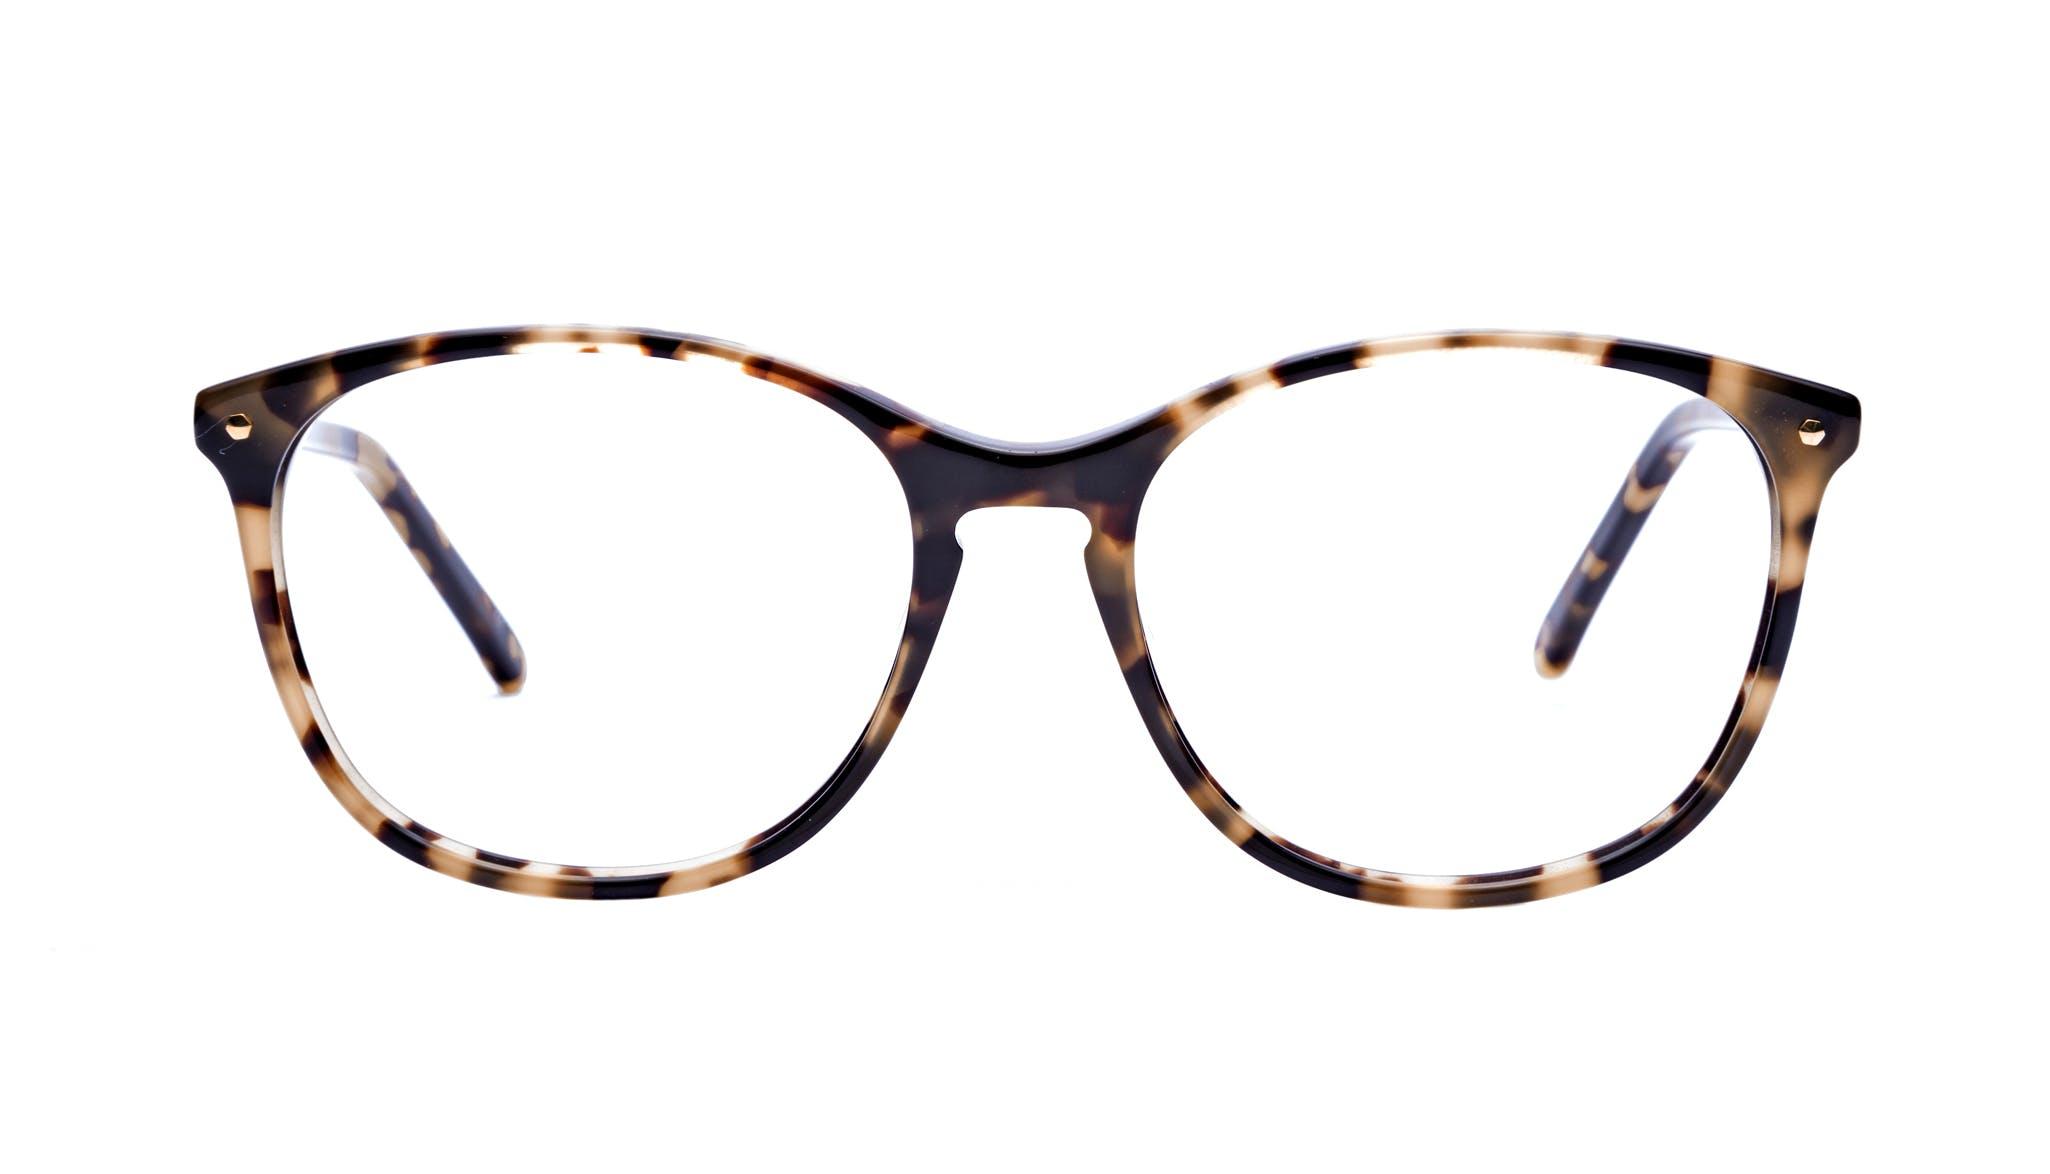 Affordable Fashion Glasses Rectangle Square Round Eyeglasses Women Nadine Bingal Front